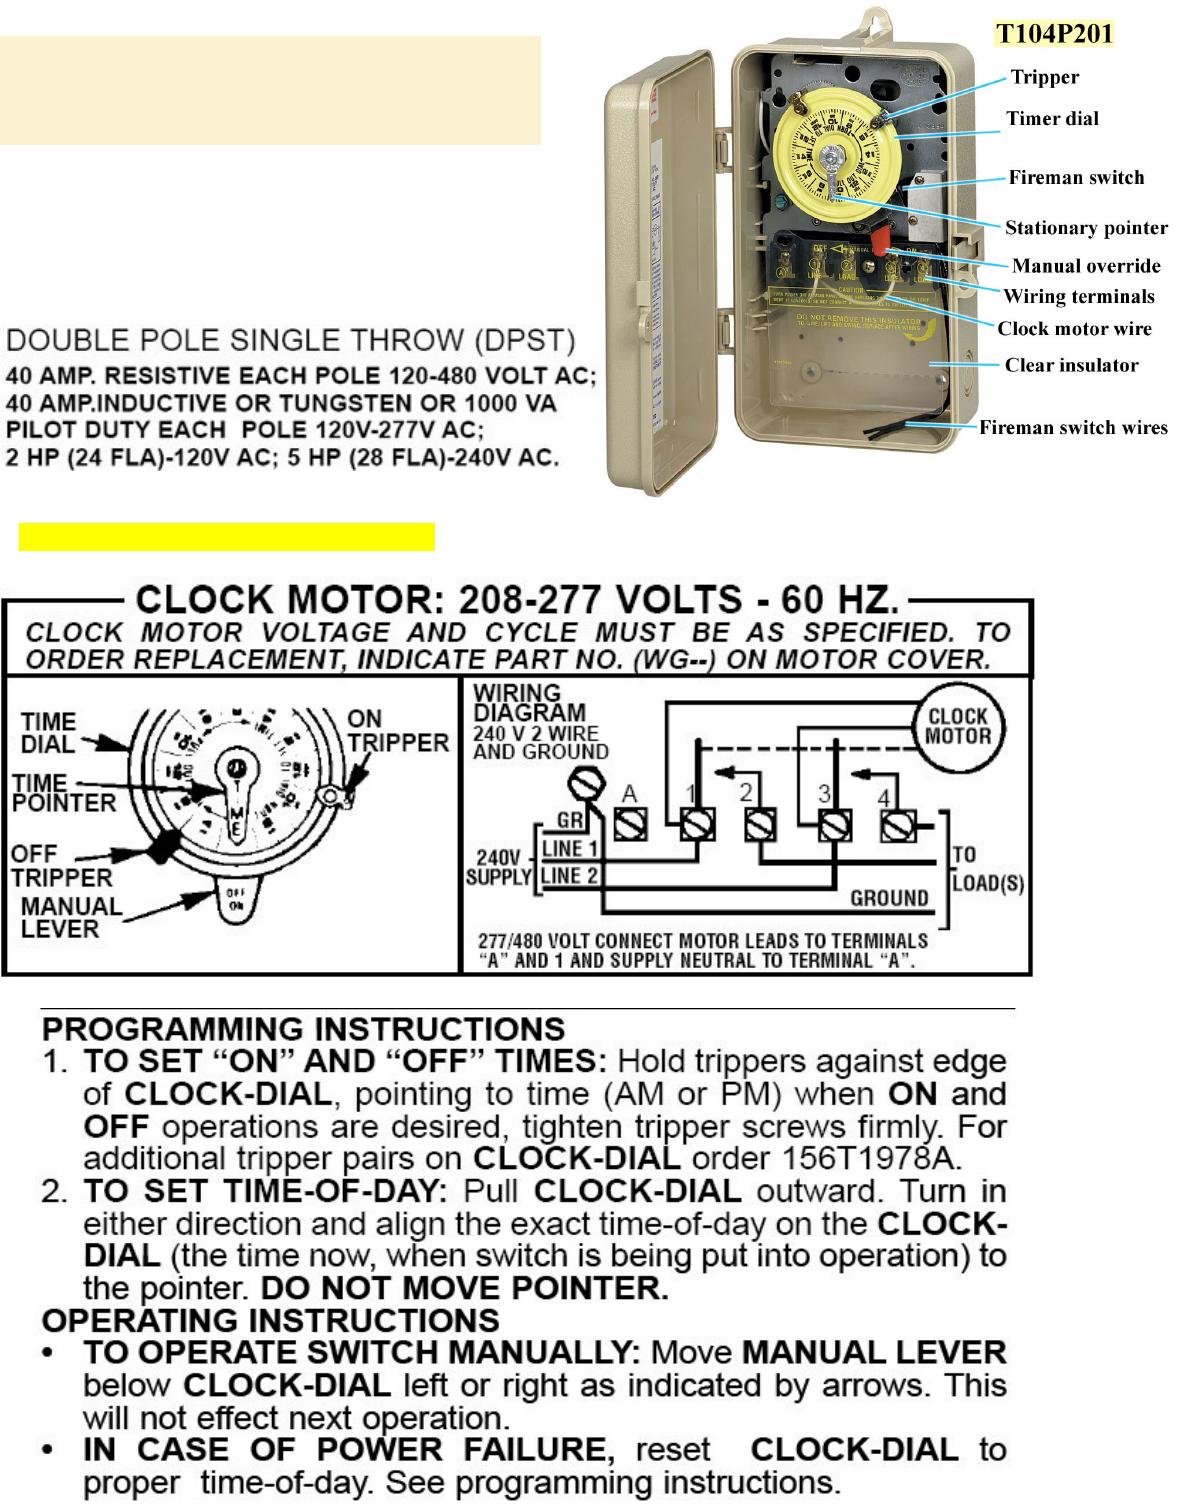 [SCHEMATICS_4FD]  Intermatic T104P201 instruction manual T104R201 | Intermatic T104r201 Wiring Diagram |  | UserManual.wiki